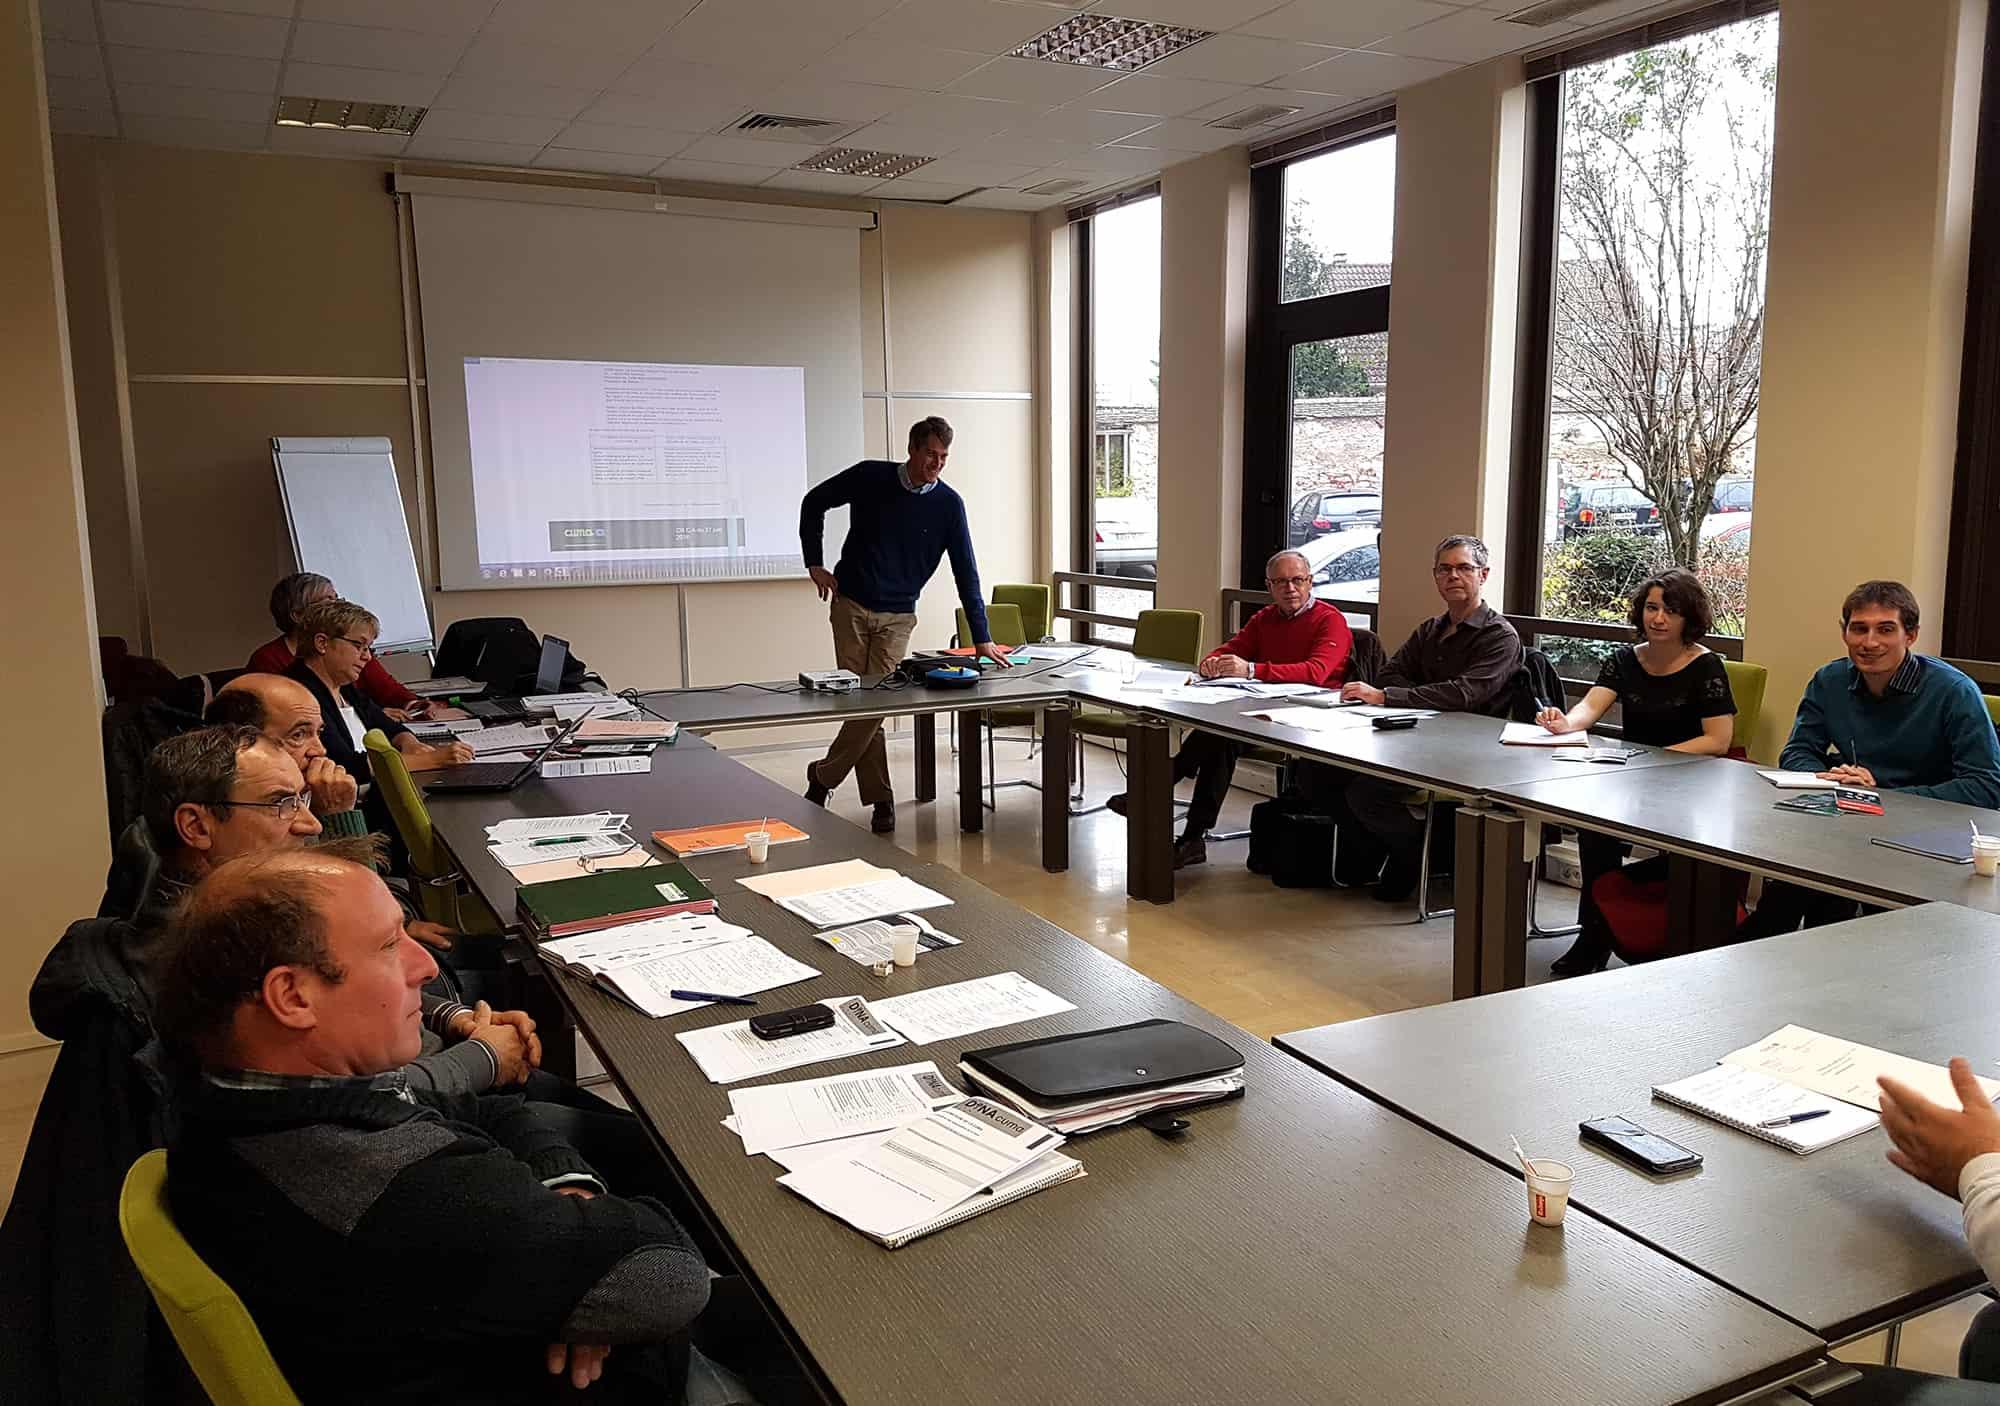 conseil administration_Frcuma IIe de France